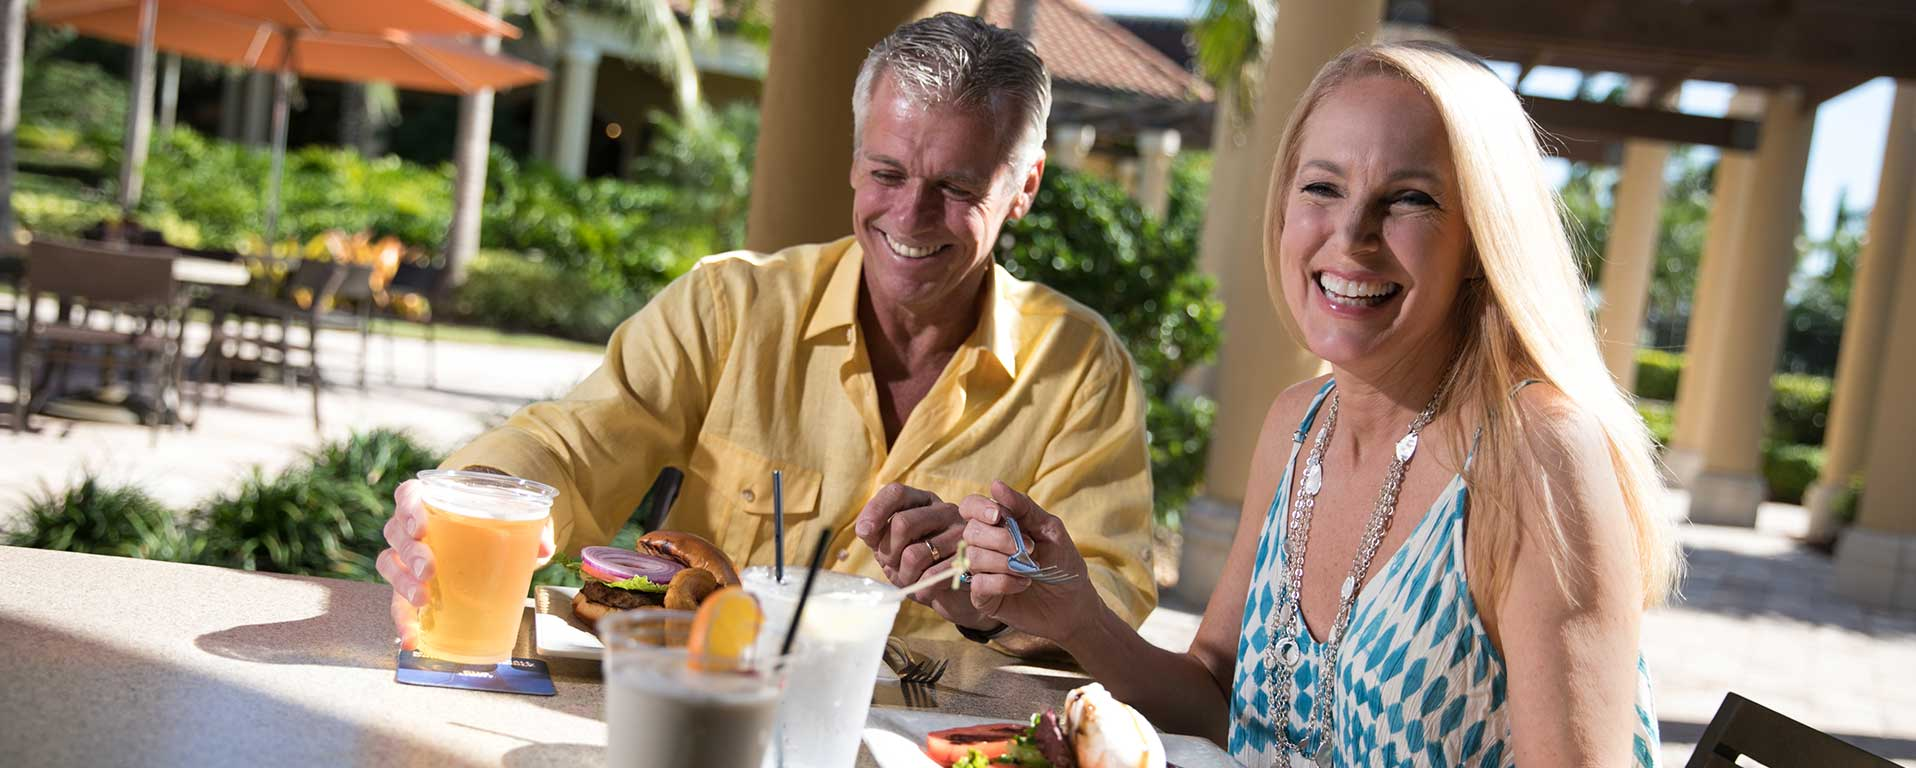 Peninsula Naples Social Hub, Bar, Fine Dining, Clubhouse, Golf Course, Treviso Bay, Peninsula, TPC Golf, Naples, Florida, Paradise Coast, Peninsula Treviso Bay,